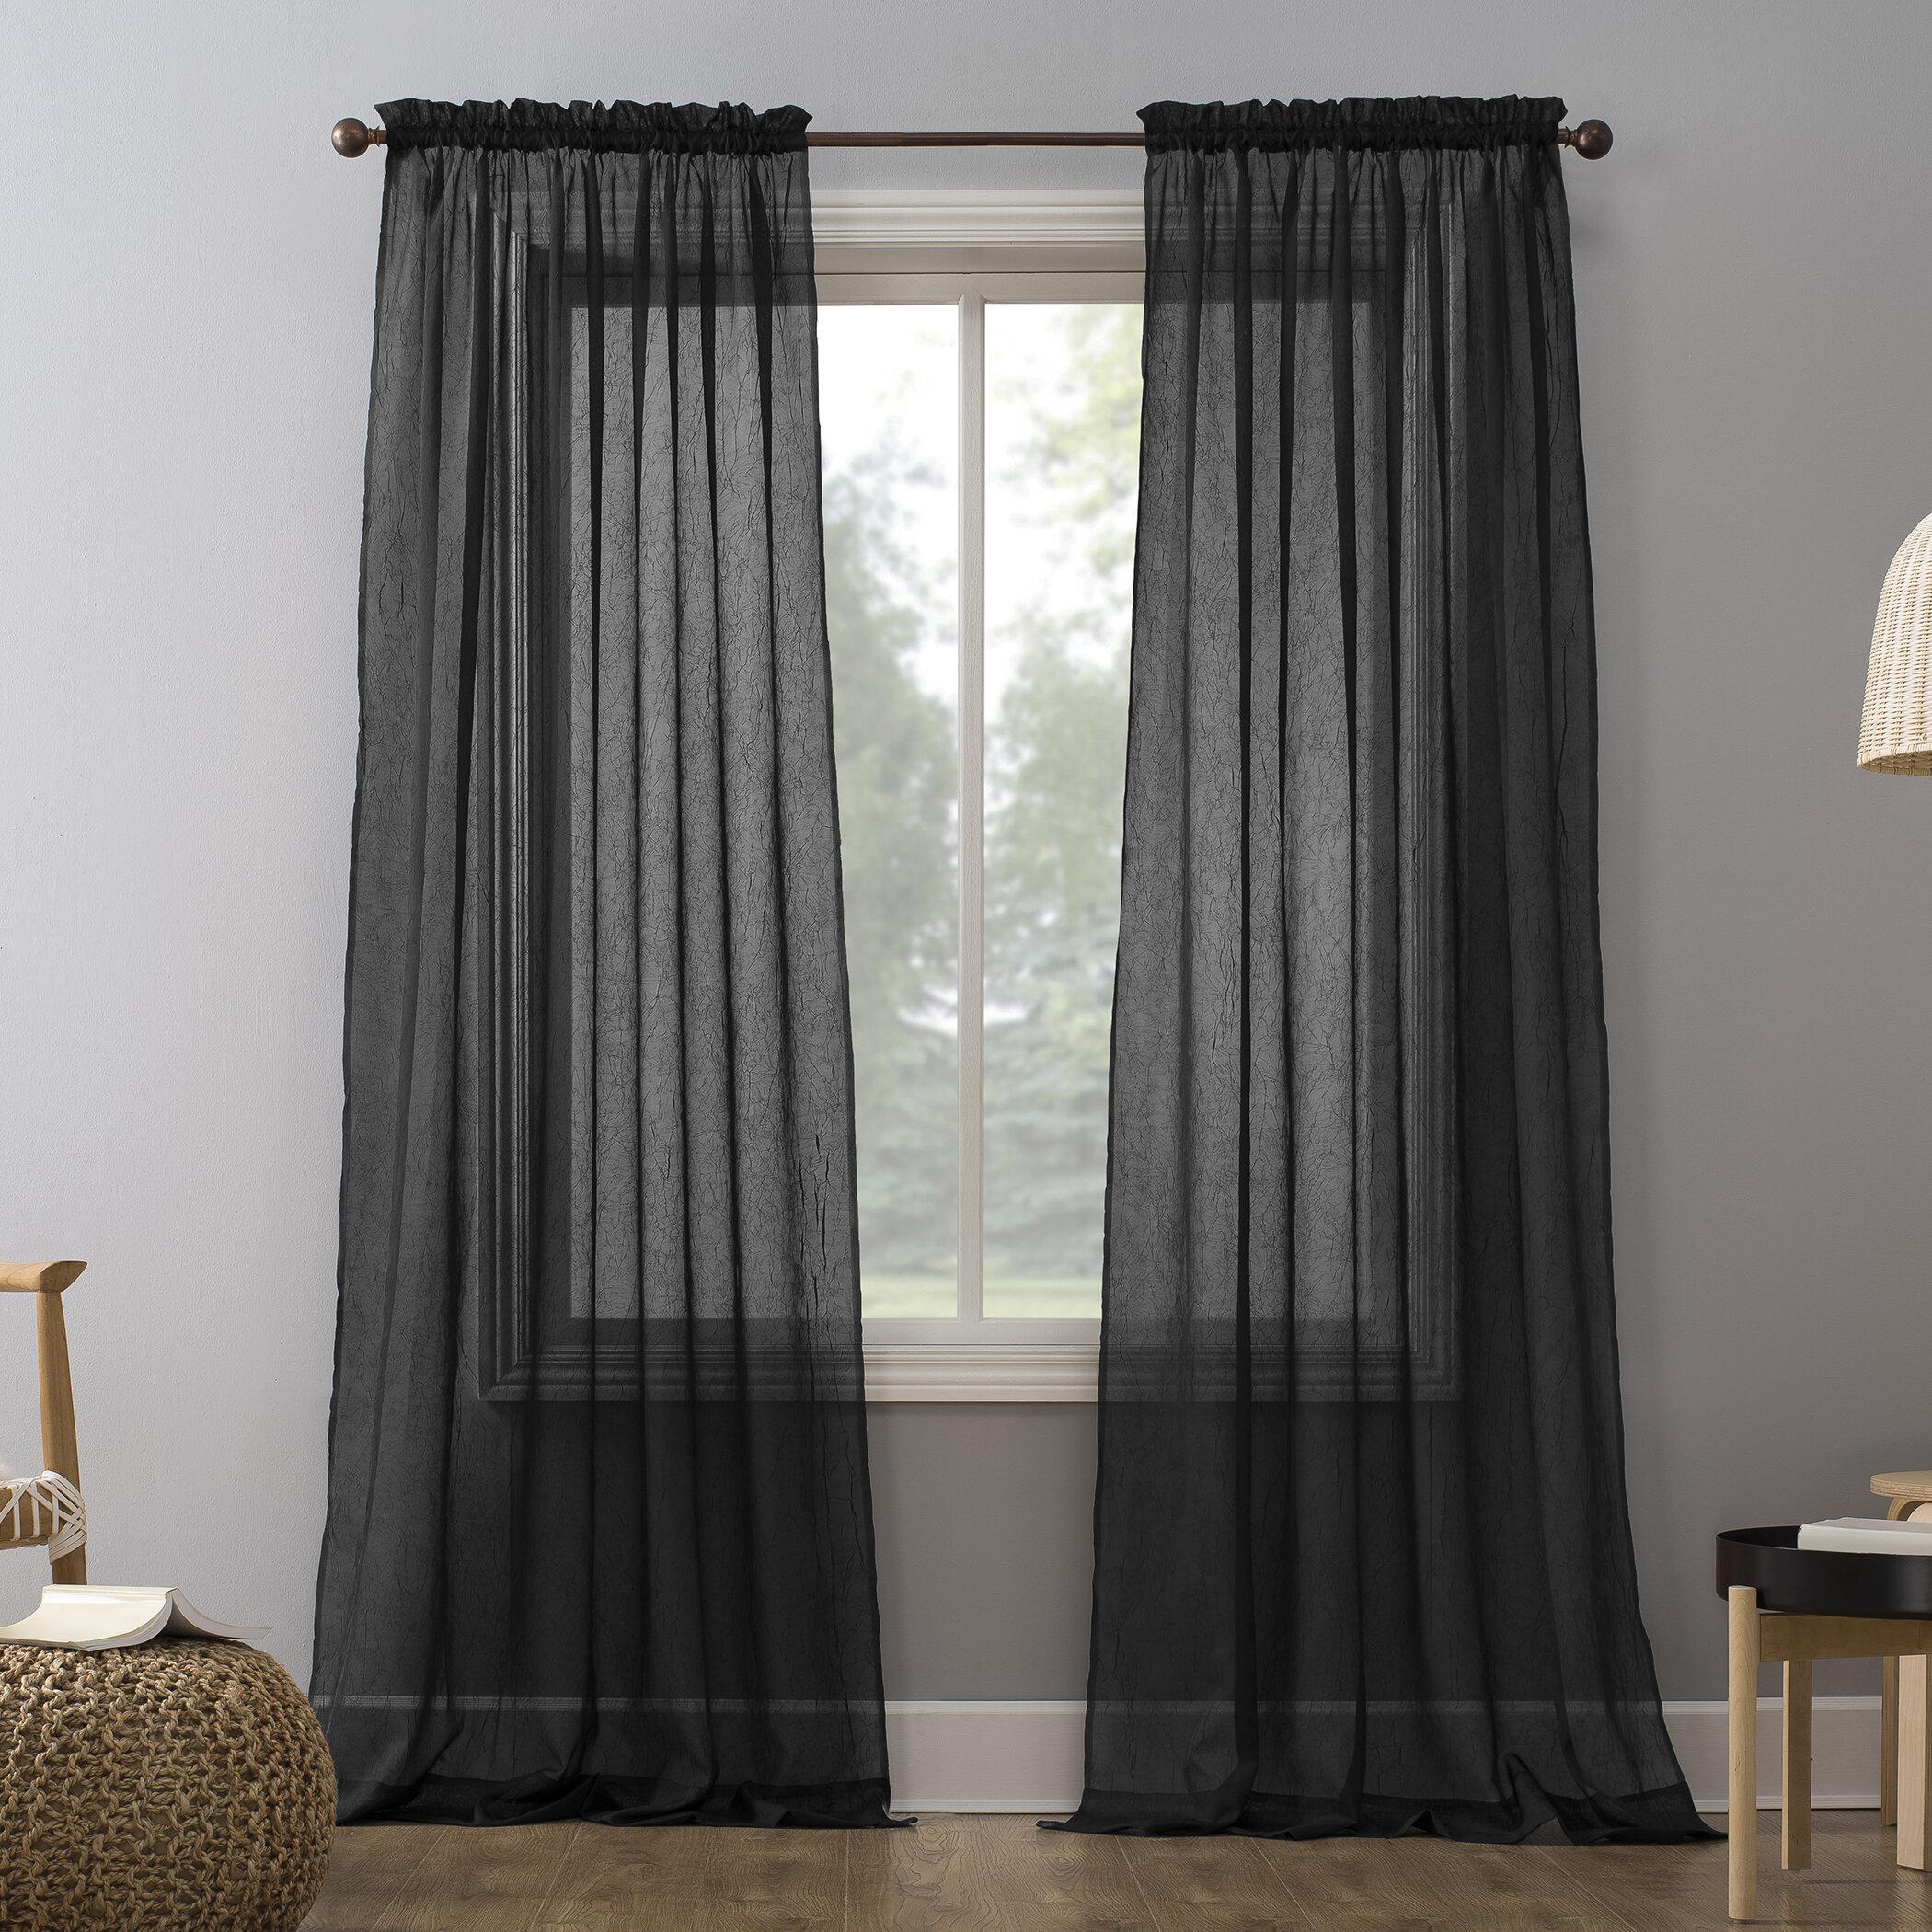 Black Sheer Curtains Drapes Free Shipping Over 35 Wayfair